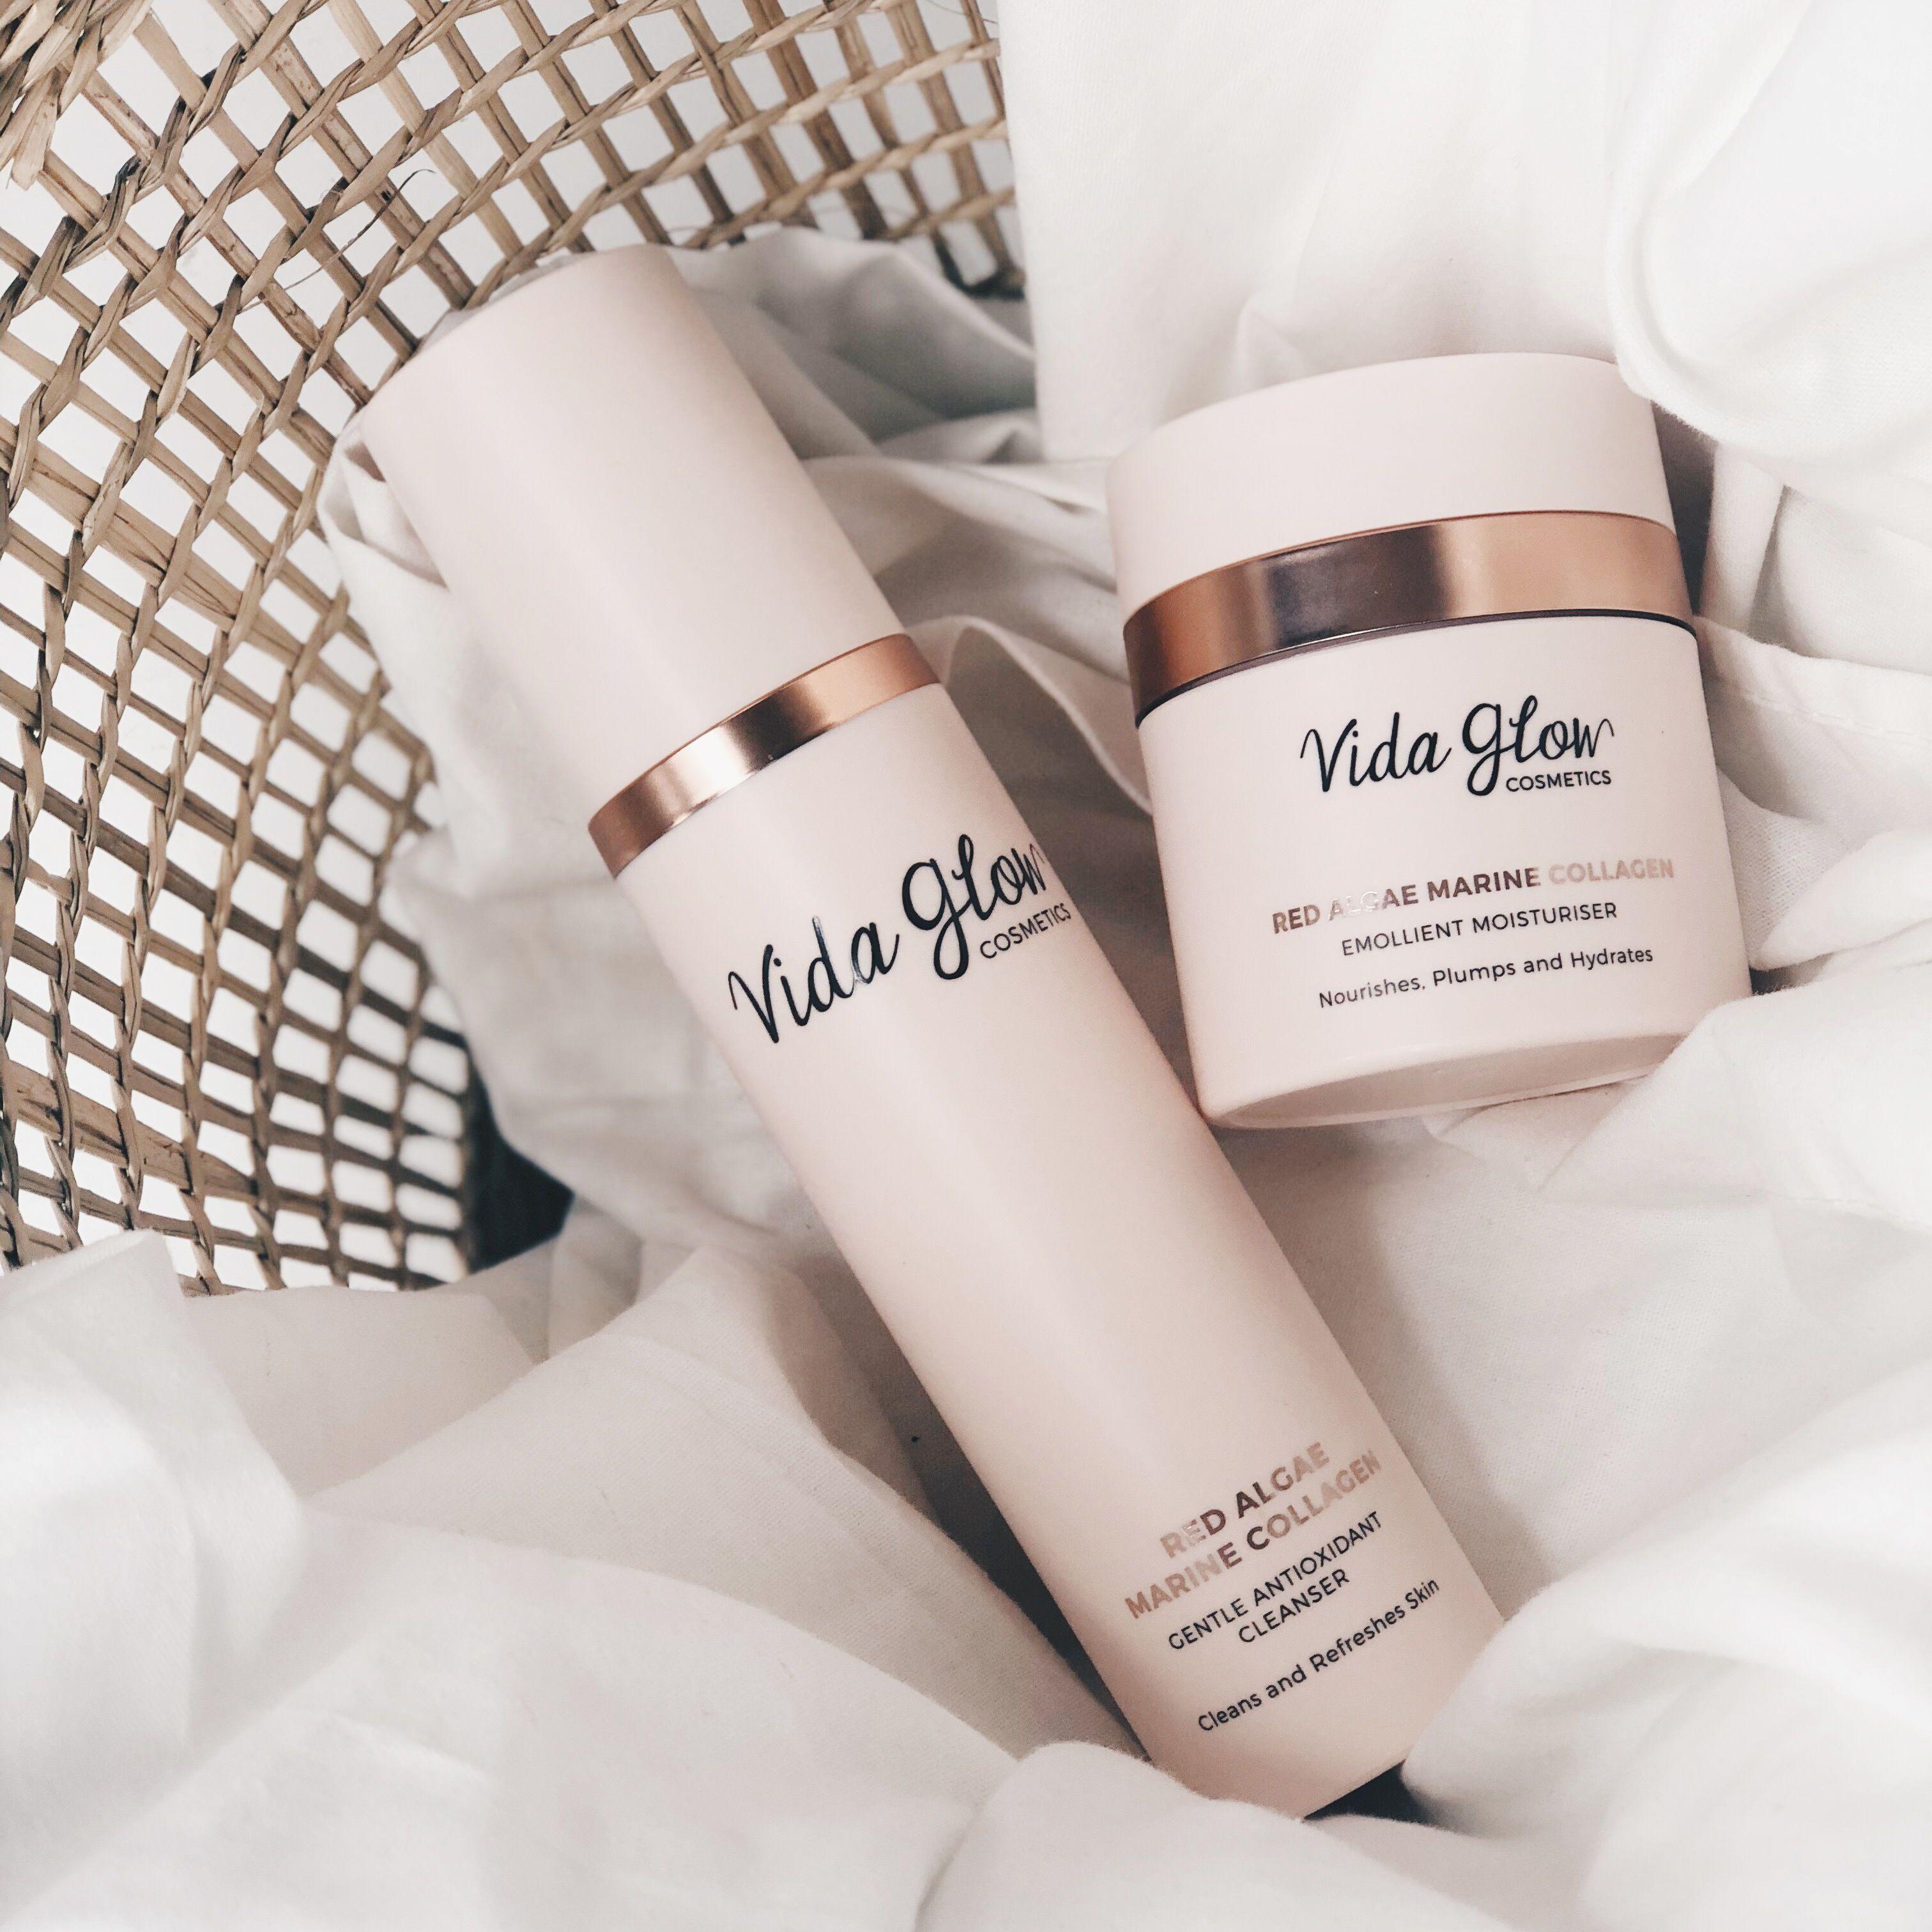 Vida Glow's Marine Collagen Skin Care range. Made with Red